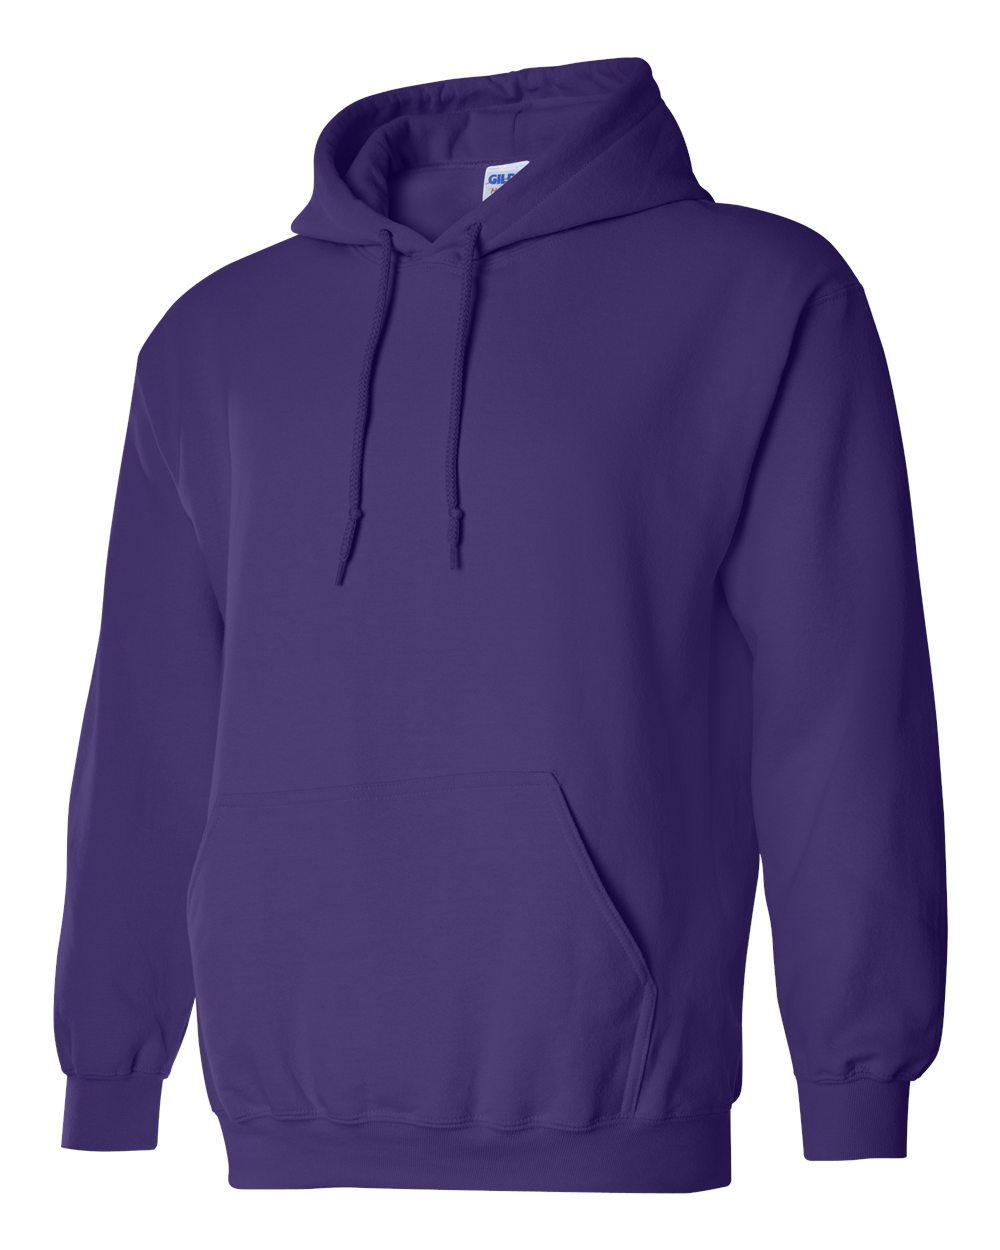 Gildan Heavy Blend Hooded Sweatshirt GI18500 Purple